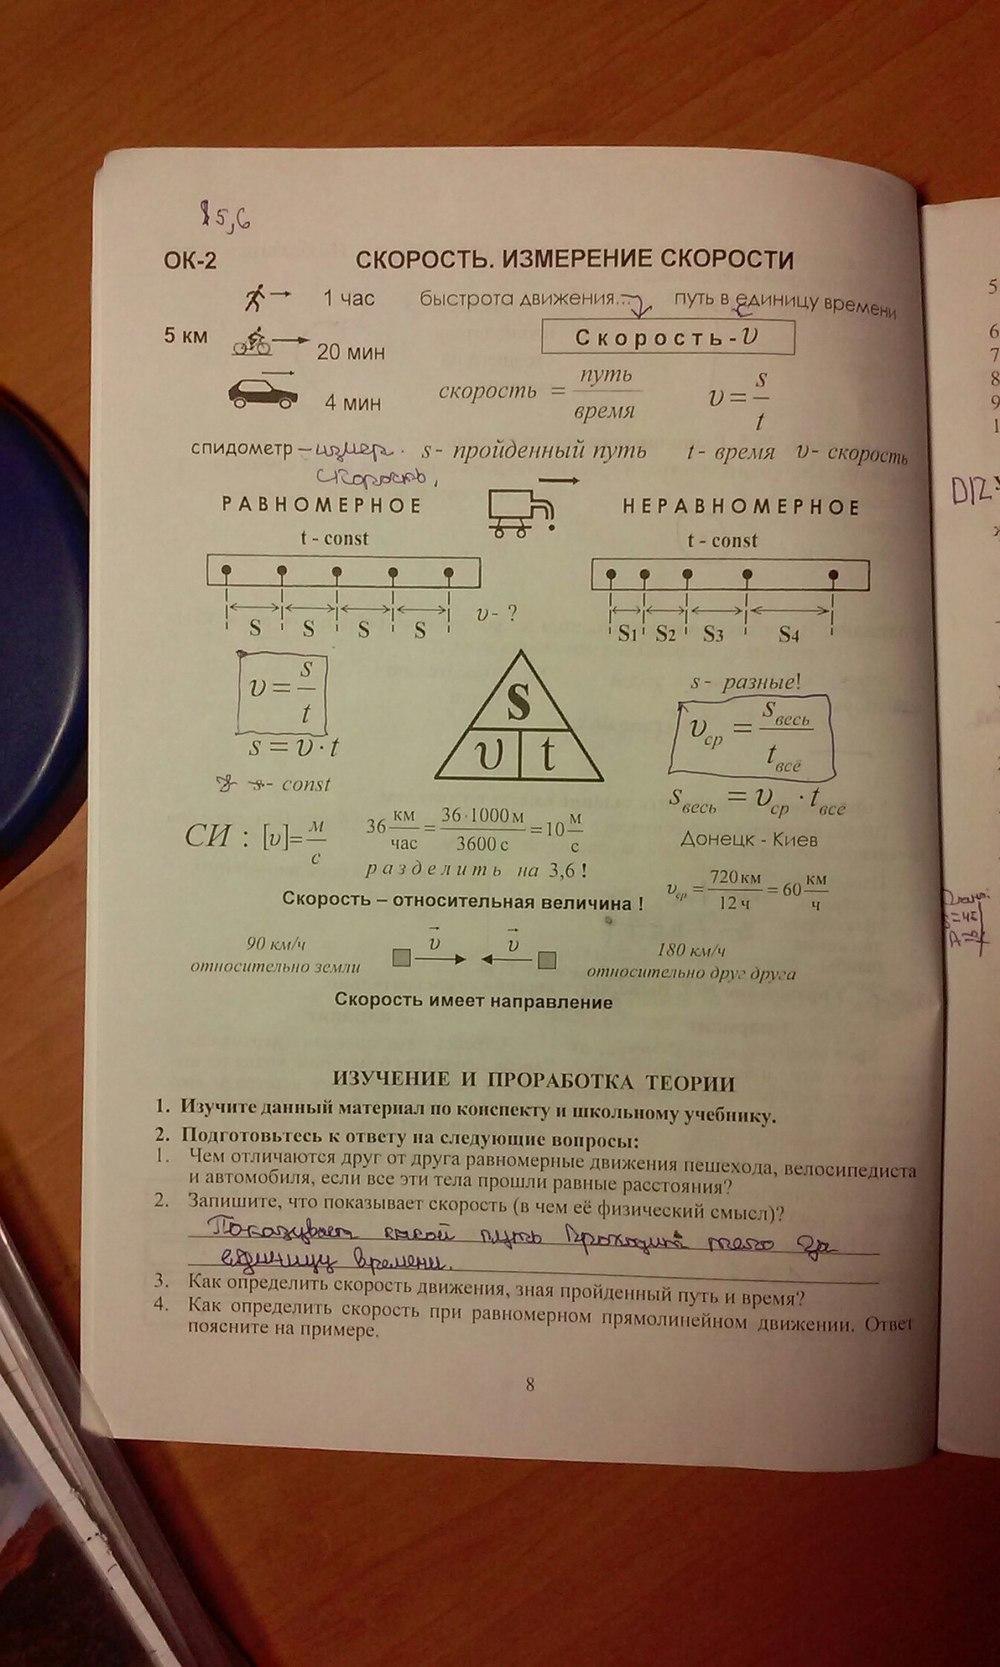 гдз физика 7 класс лифарь